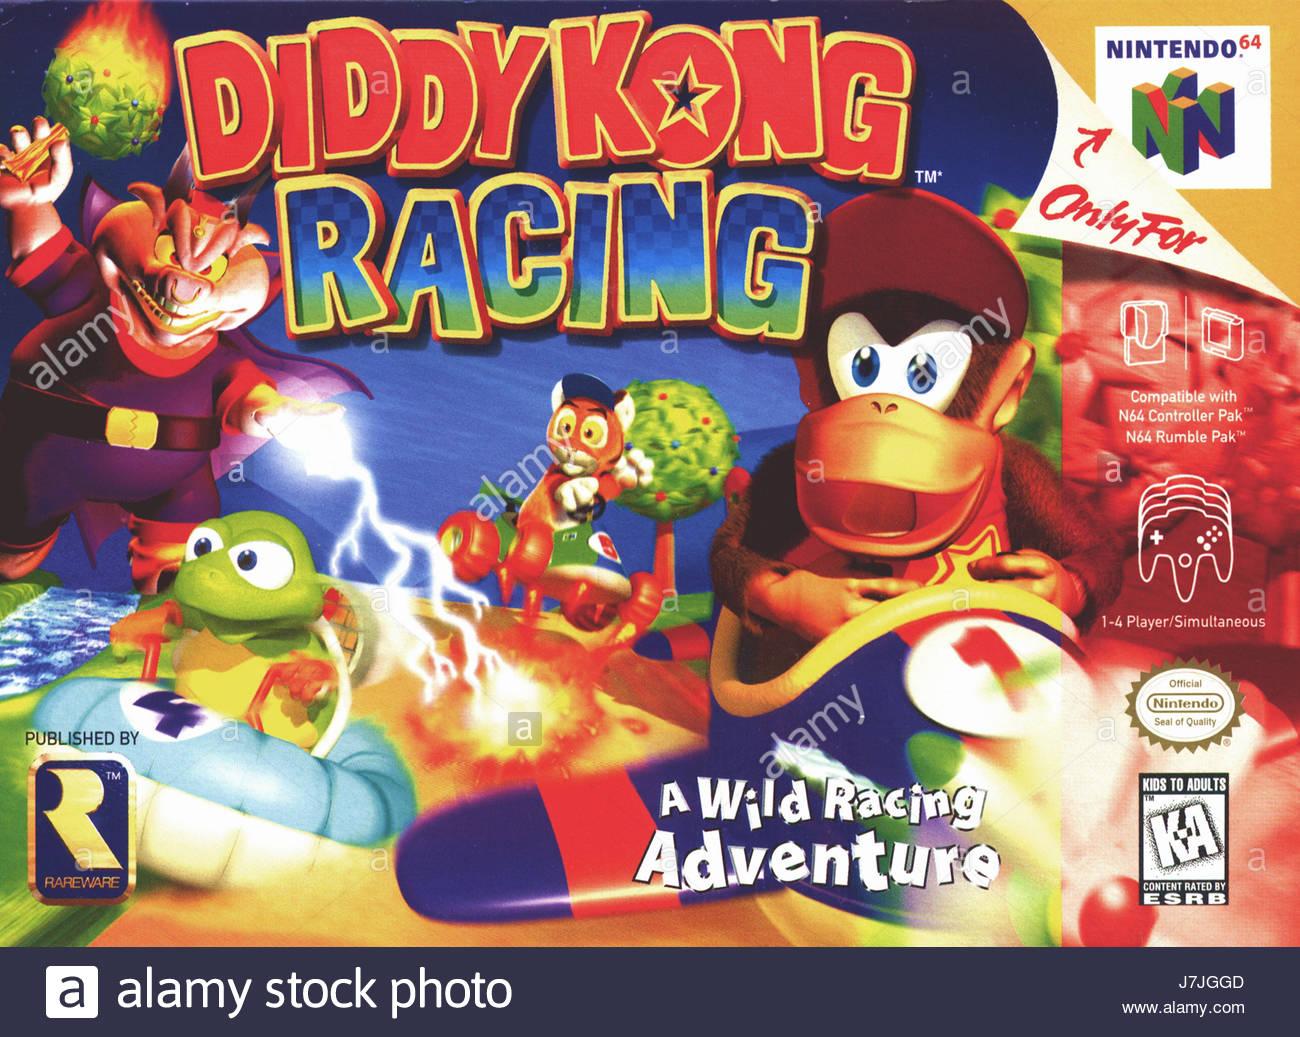 Diddy Kong Racing On N64 Original Game Box Art Photograph Stock